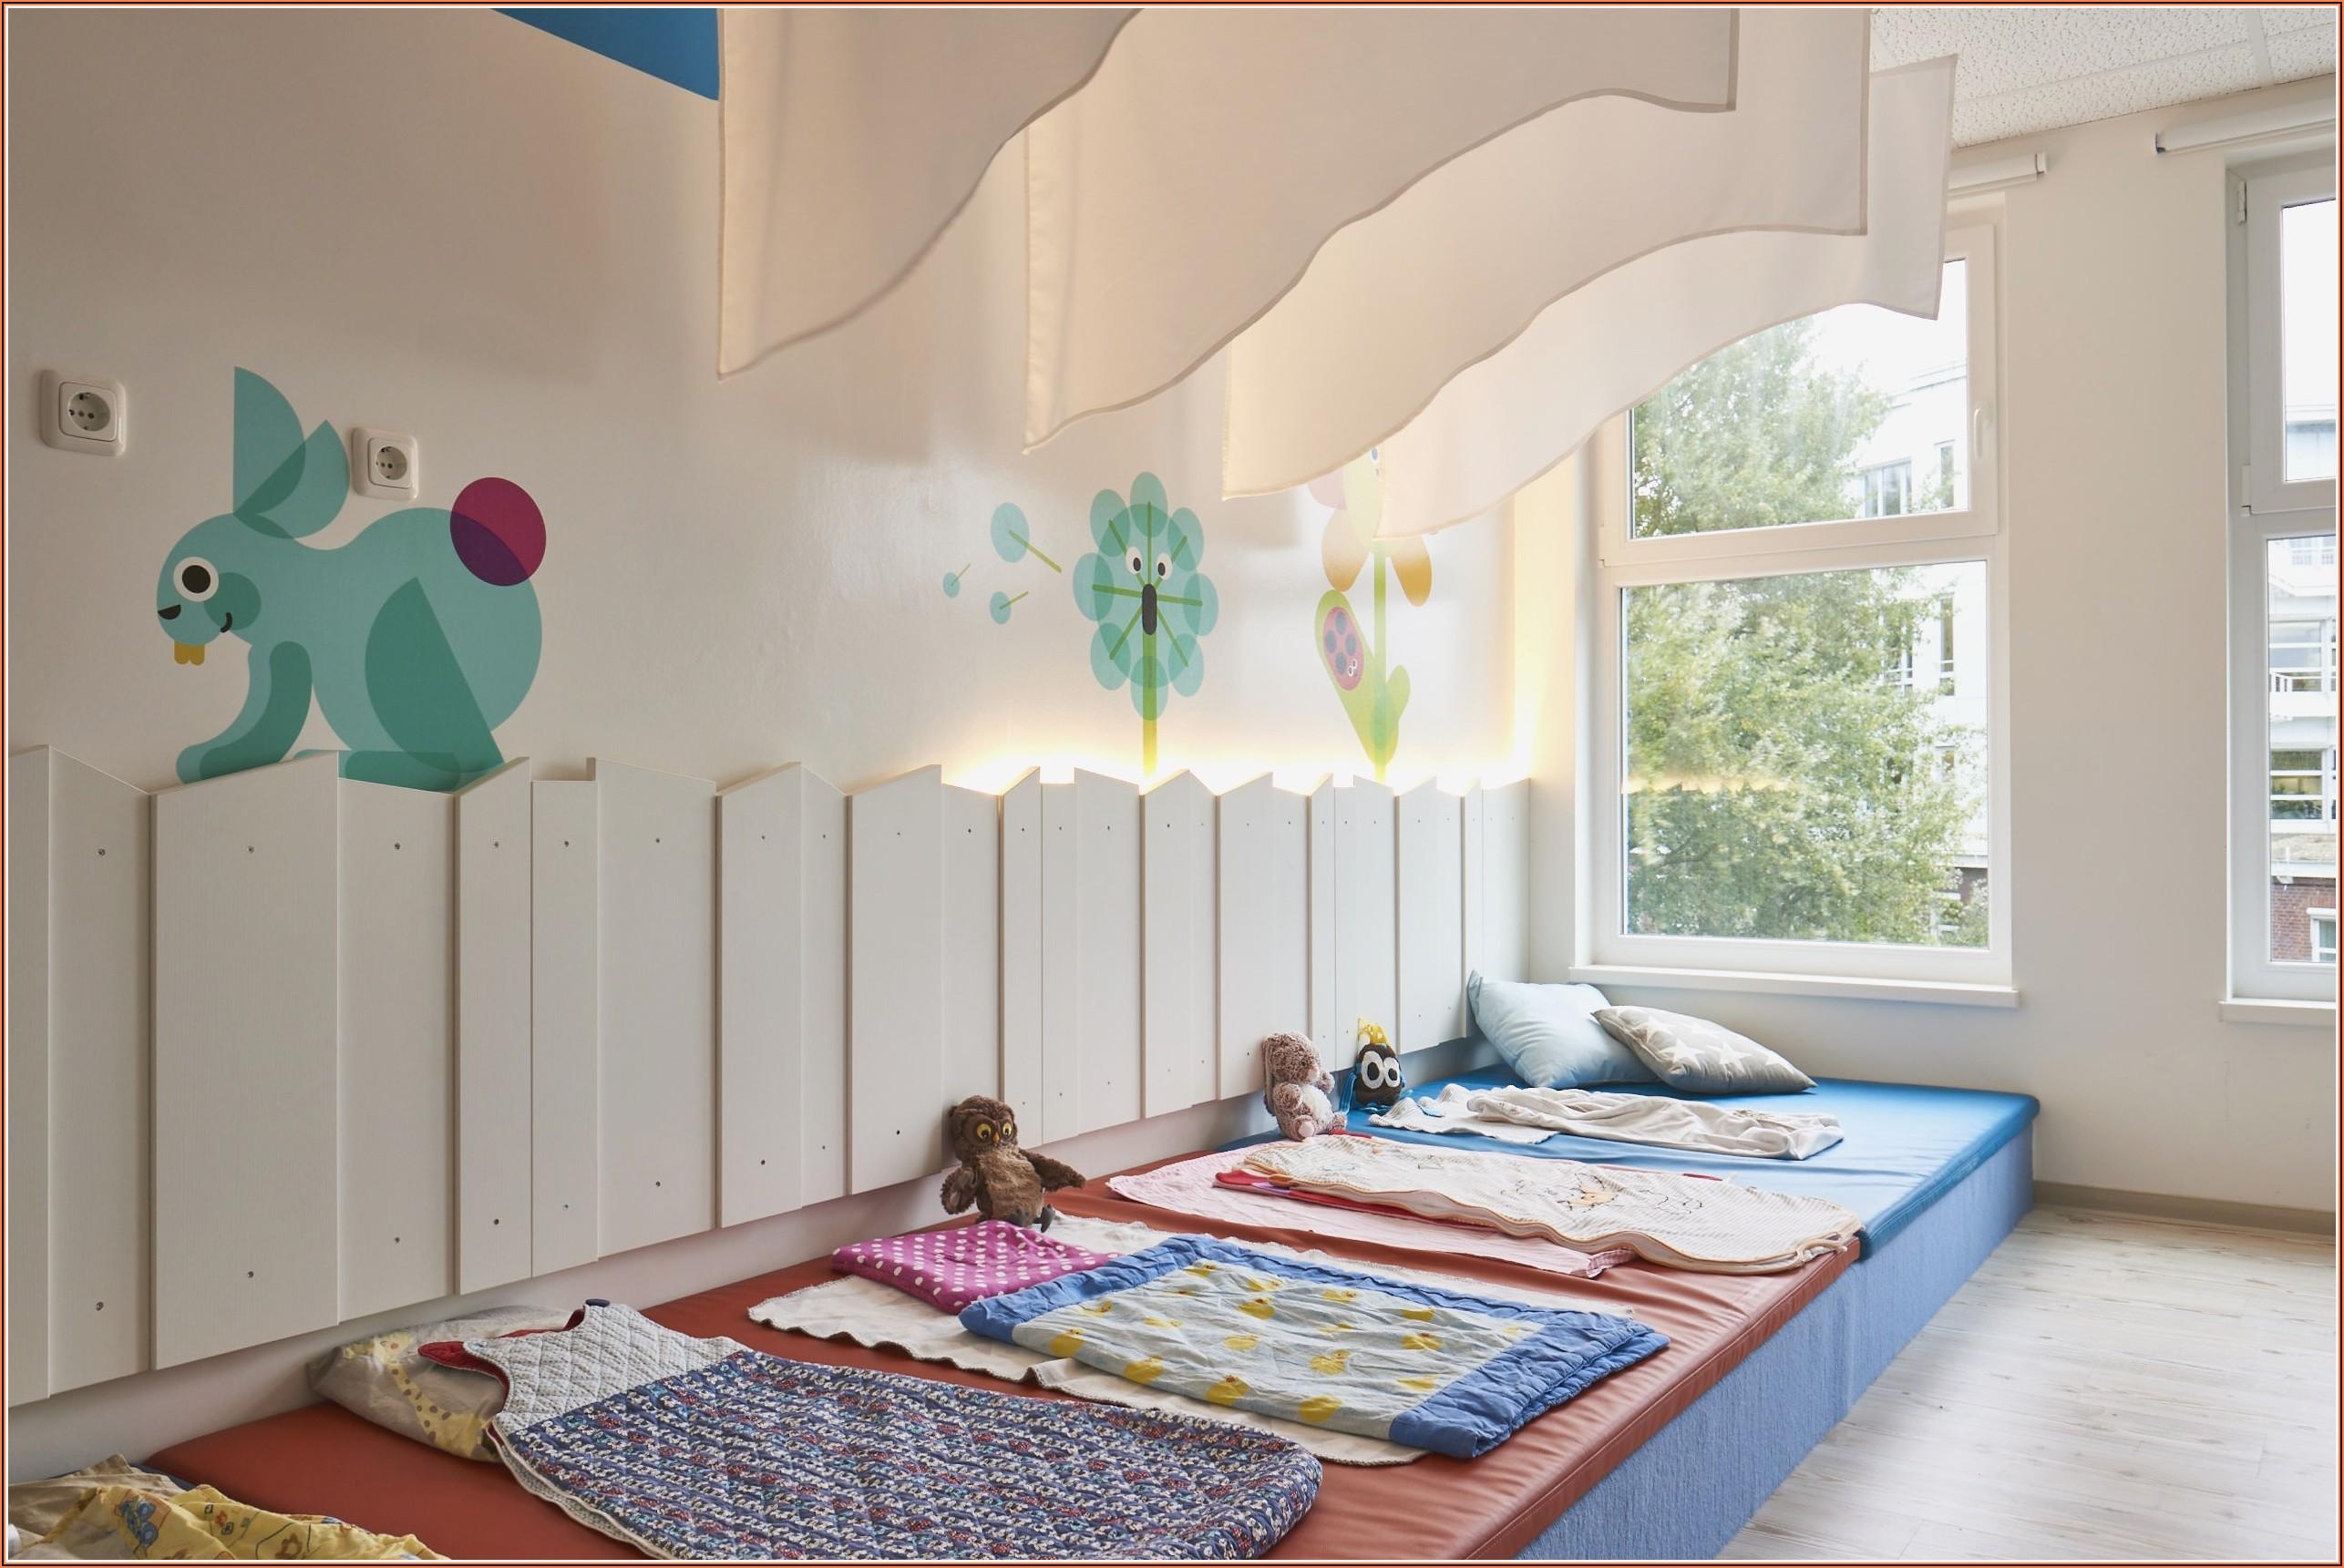 Kita Kinderzimmer Seebek (barmbek) Hamburg Nord